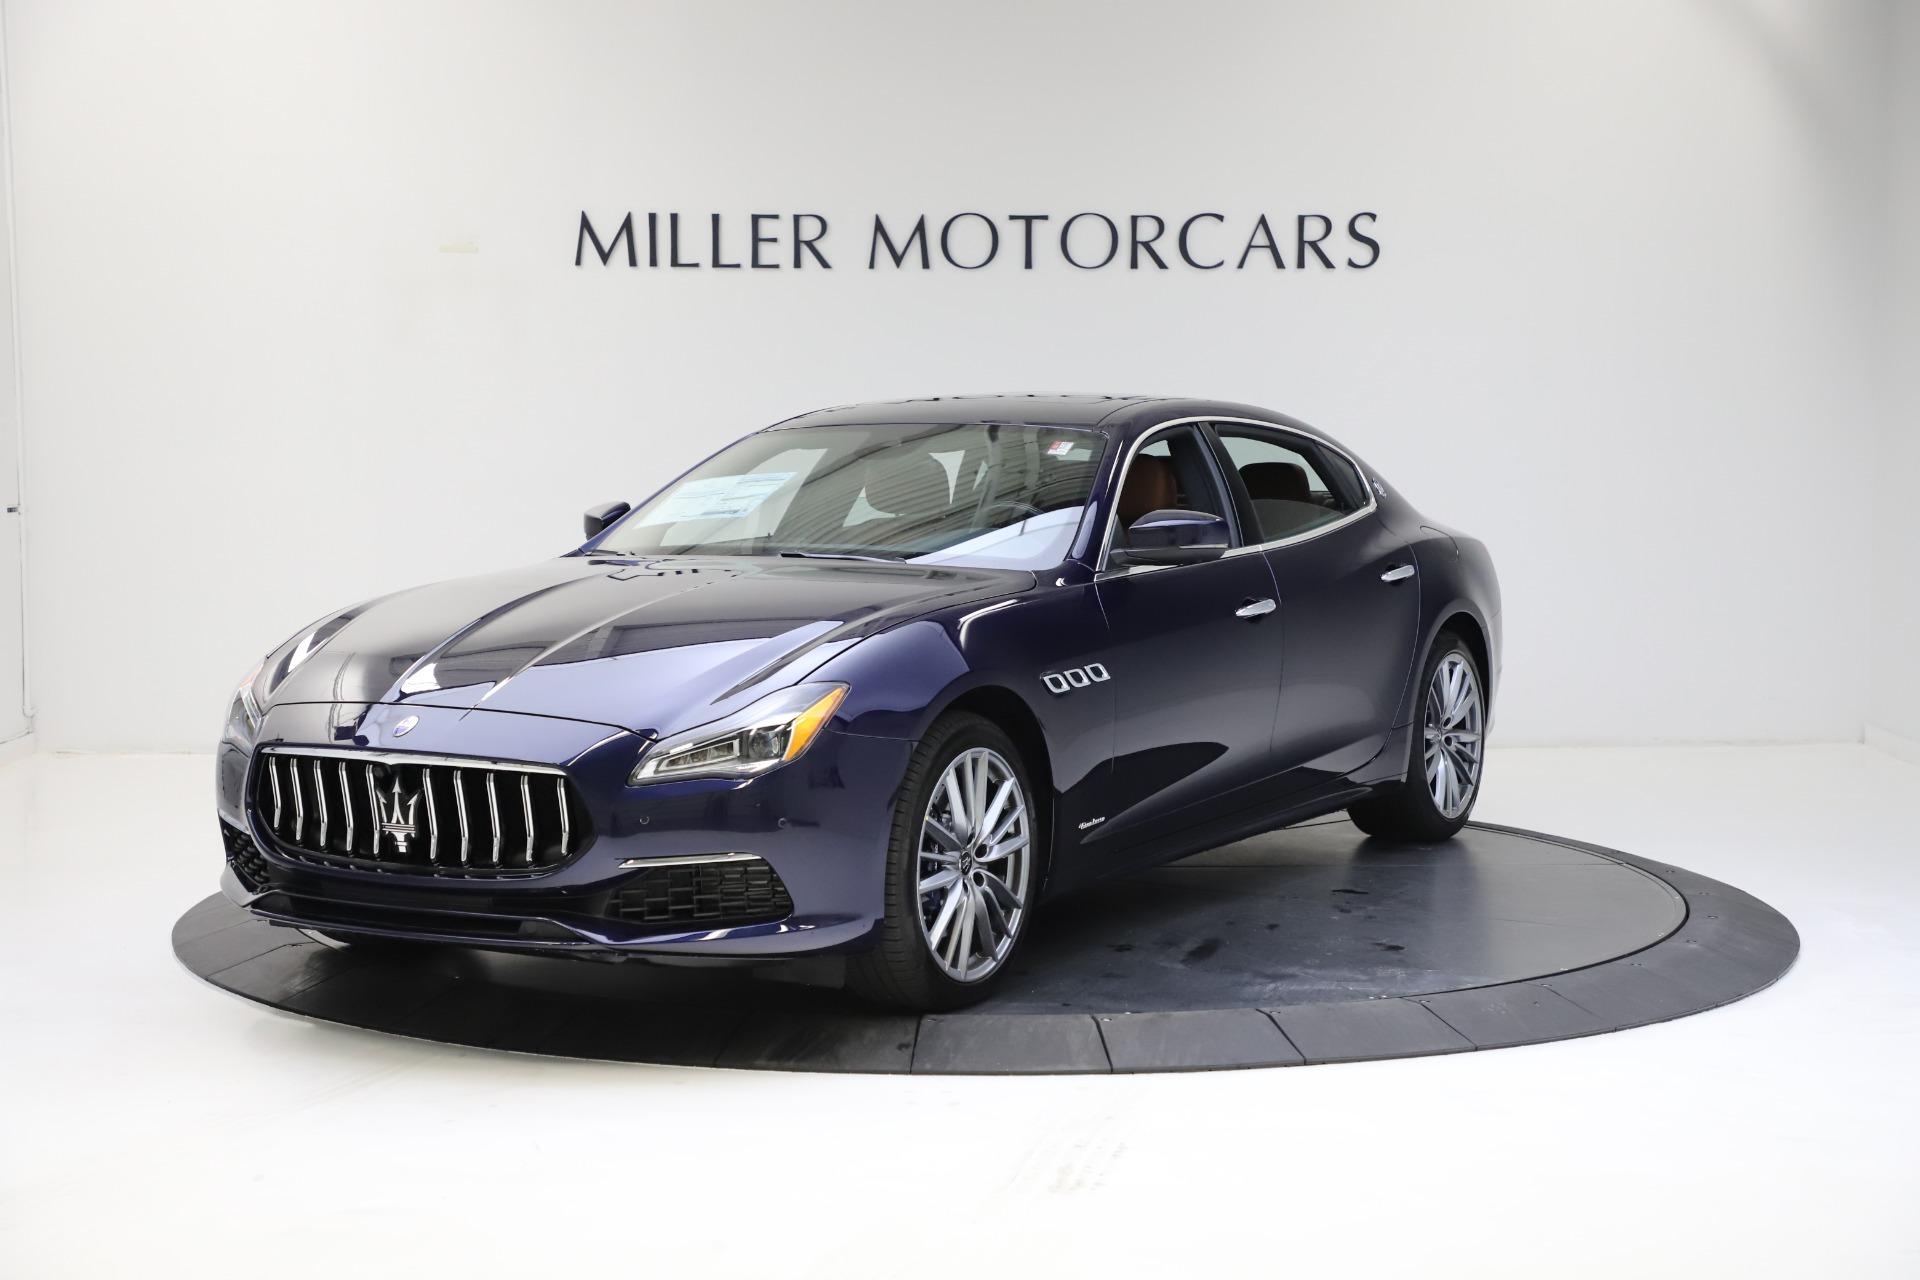 New 2021 Maserati Quattroporte S Q4 GranLusso for sale $123,549 at Rolls-Royce Motor Cars Greenwich in Greenwich CT 06830 1